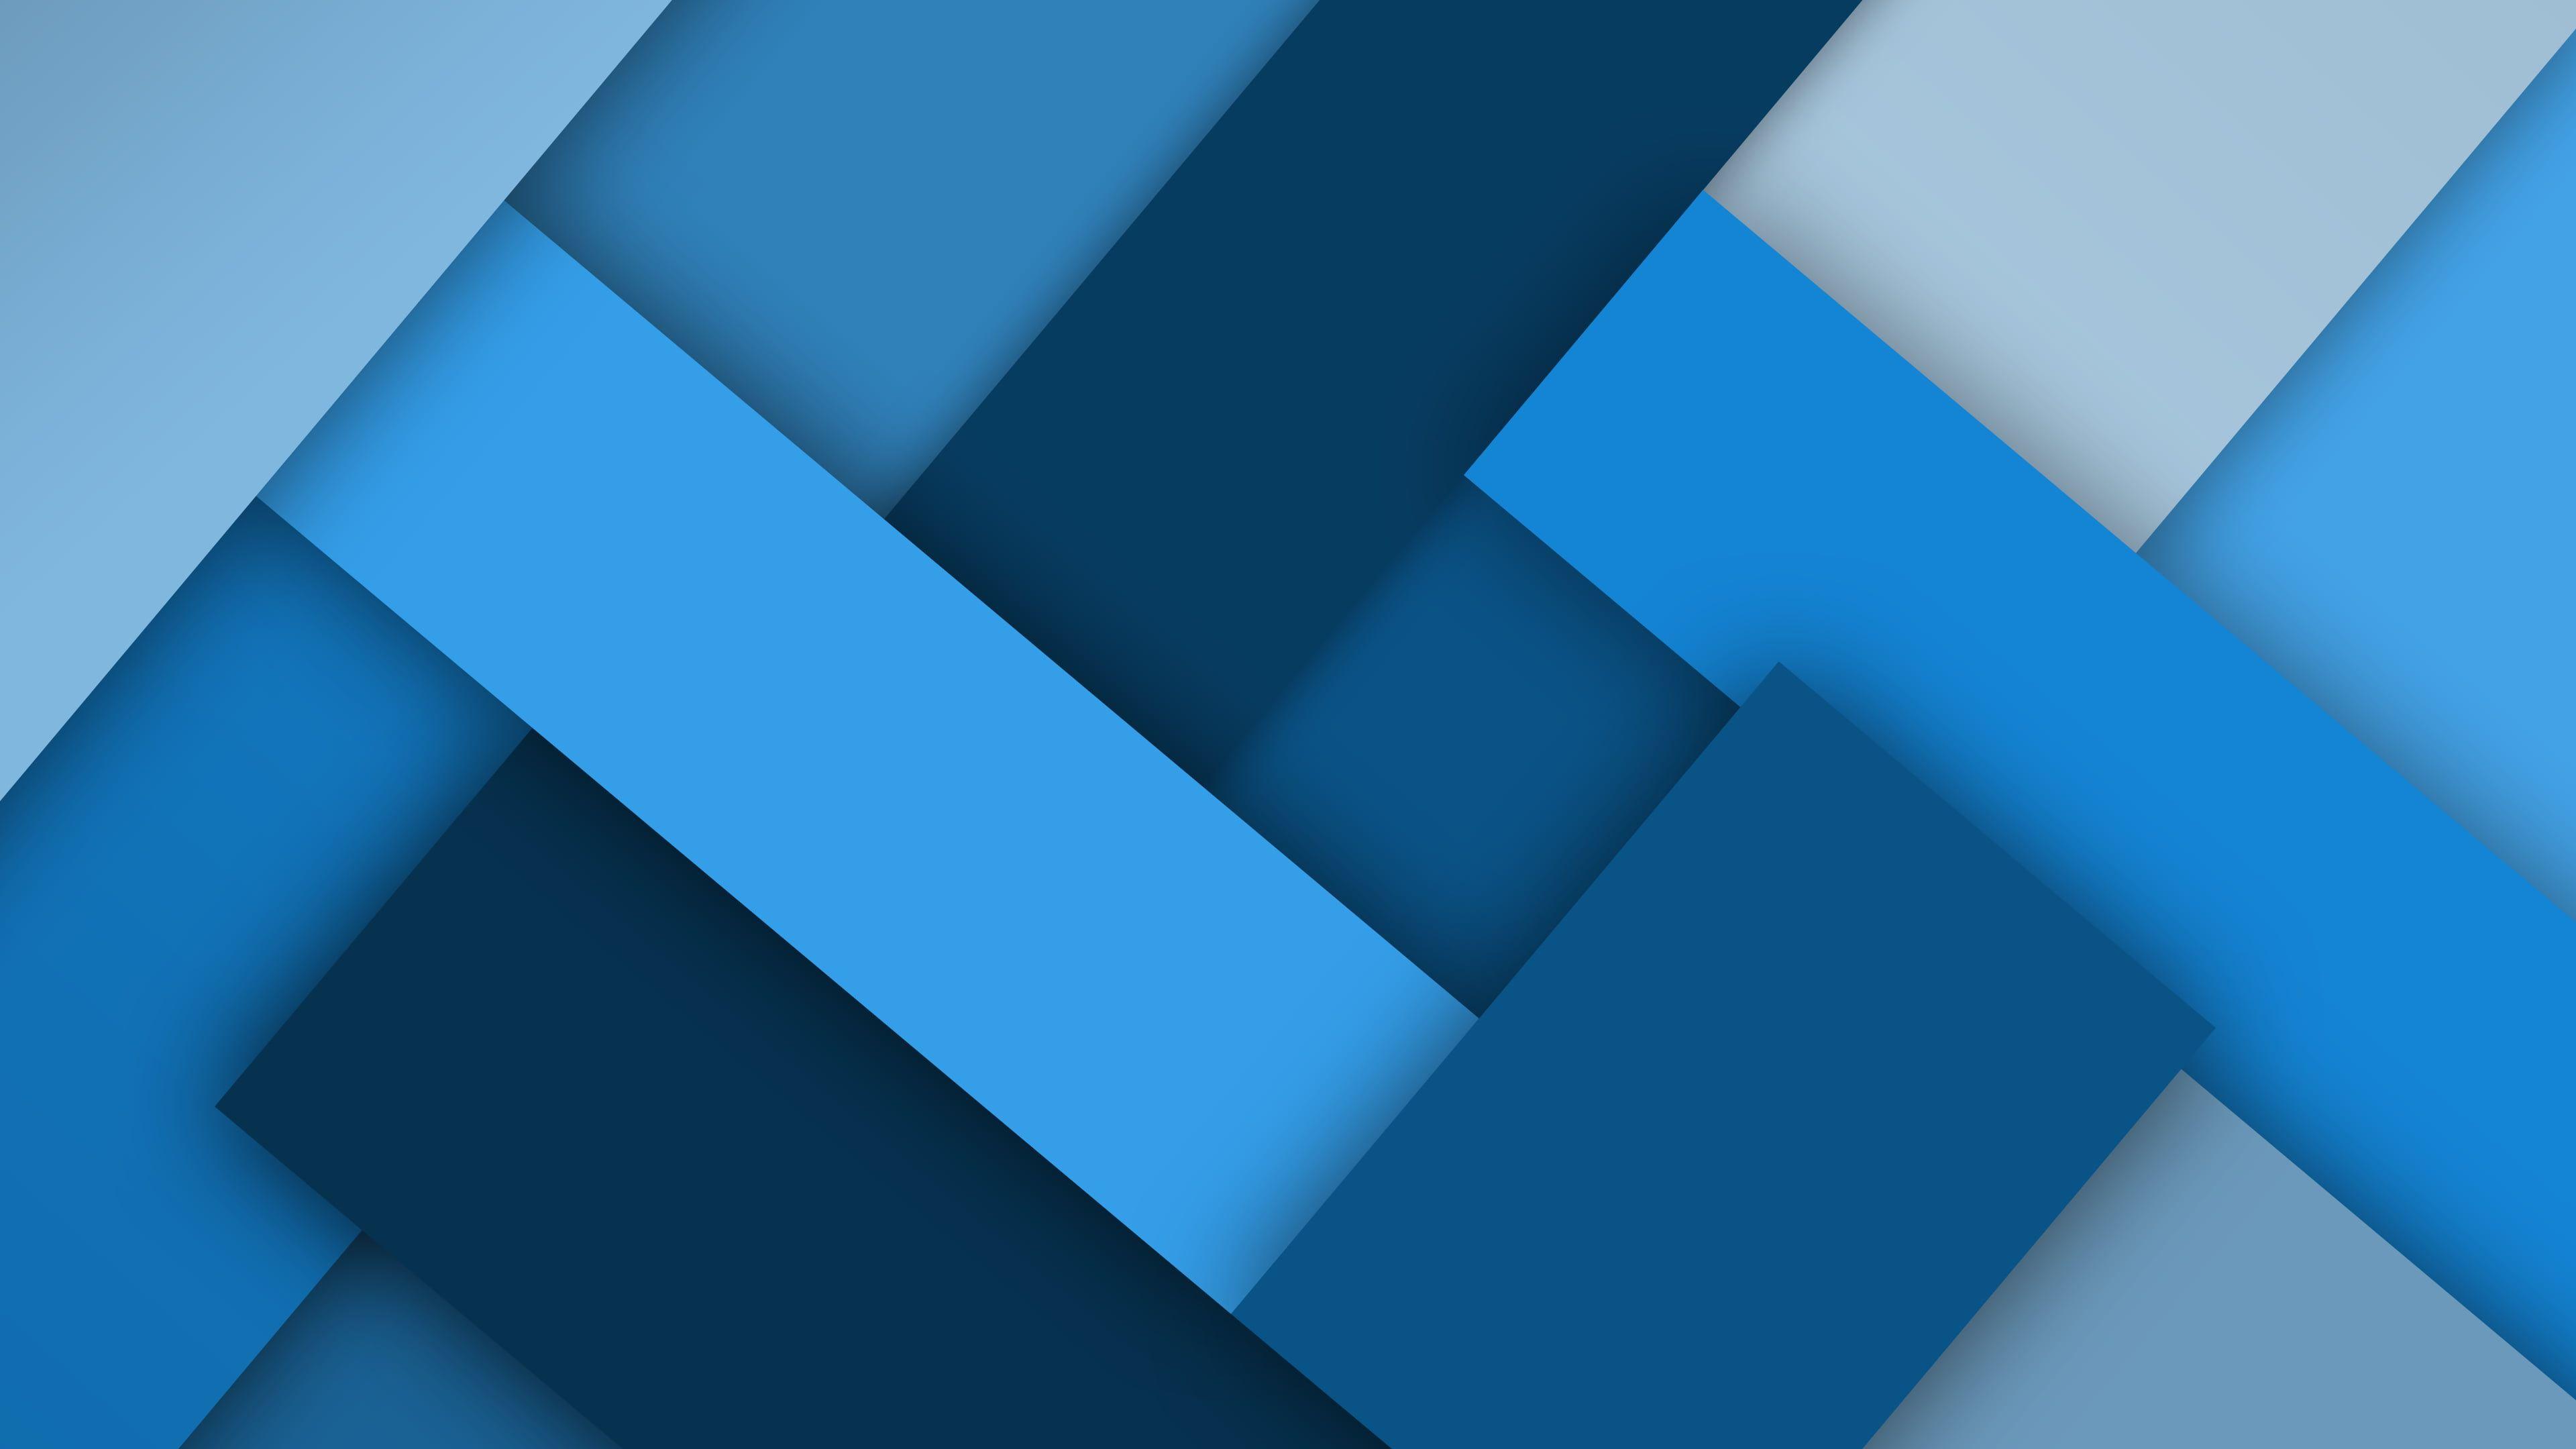 Blue And White Illustration Minimalism Digital Art Simple 4k Wallpaper Hdwallpaper Desktop Uhd Wallpaper Abstract Background Hd Wallpaper